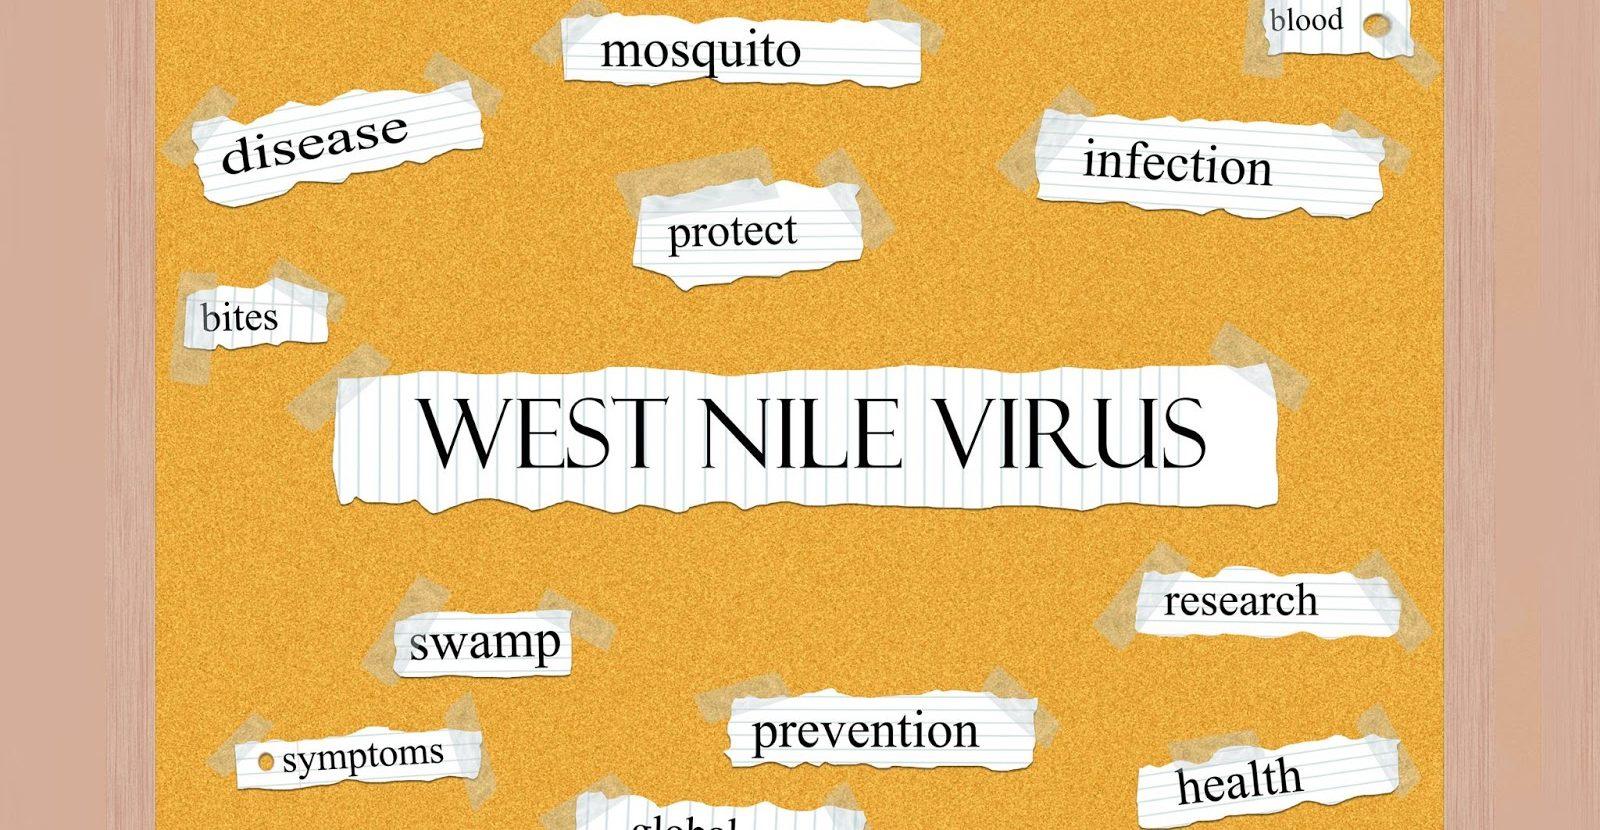 West Nile Virus Symptoms Diagnosis and Treatments